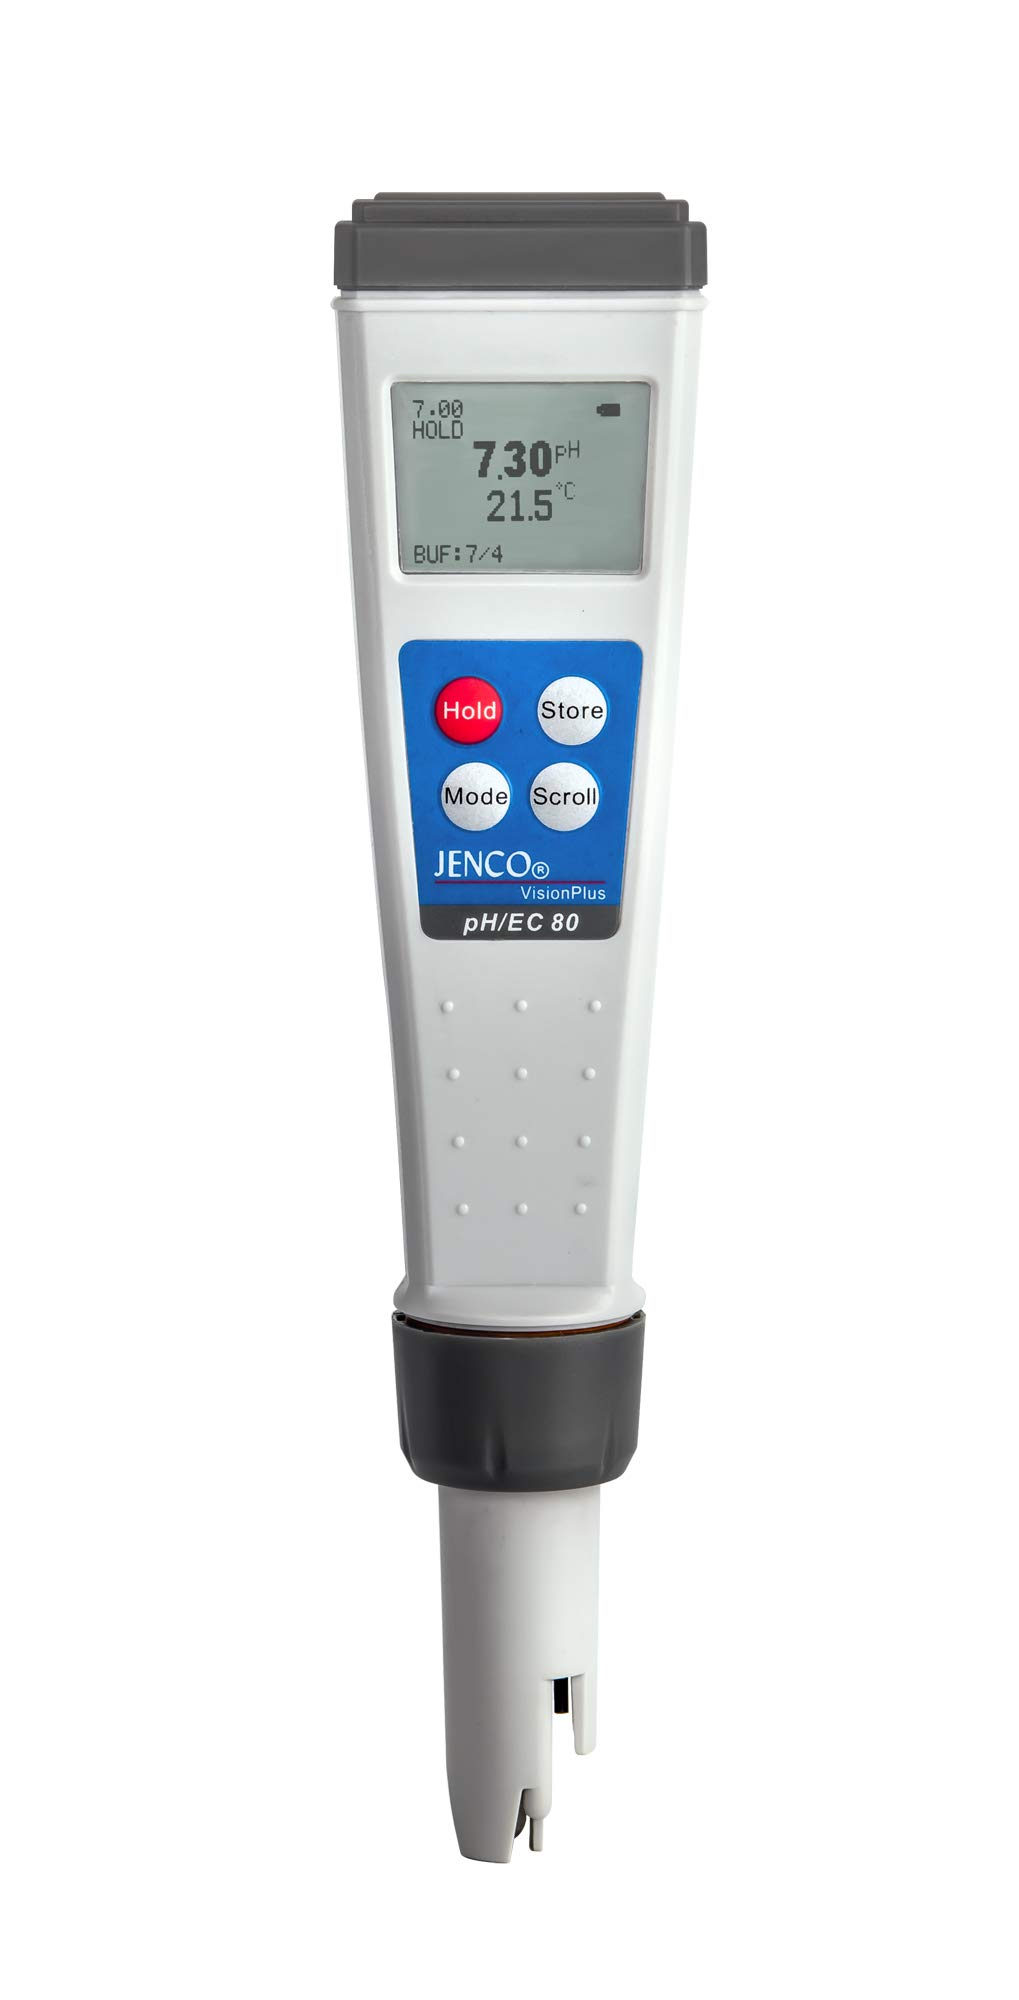 JENCO Vision Plus Series pH/EC80 Premium Waterproof Meter - (Conductivity) /TDS (ppm) /Salinity (PPT) /Temp. Multi-Parameter Pocket Tester Kit. Great for Hydroponic Growers, Pools & Spas, & Aquariums